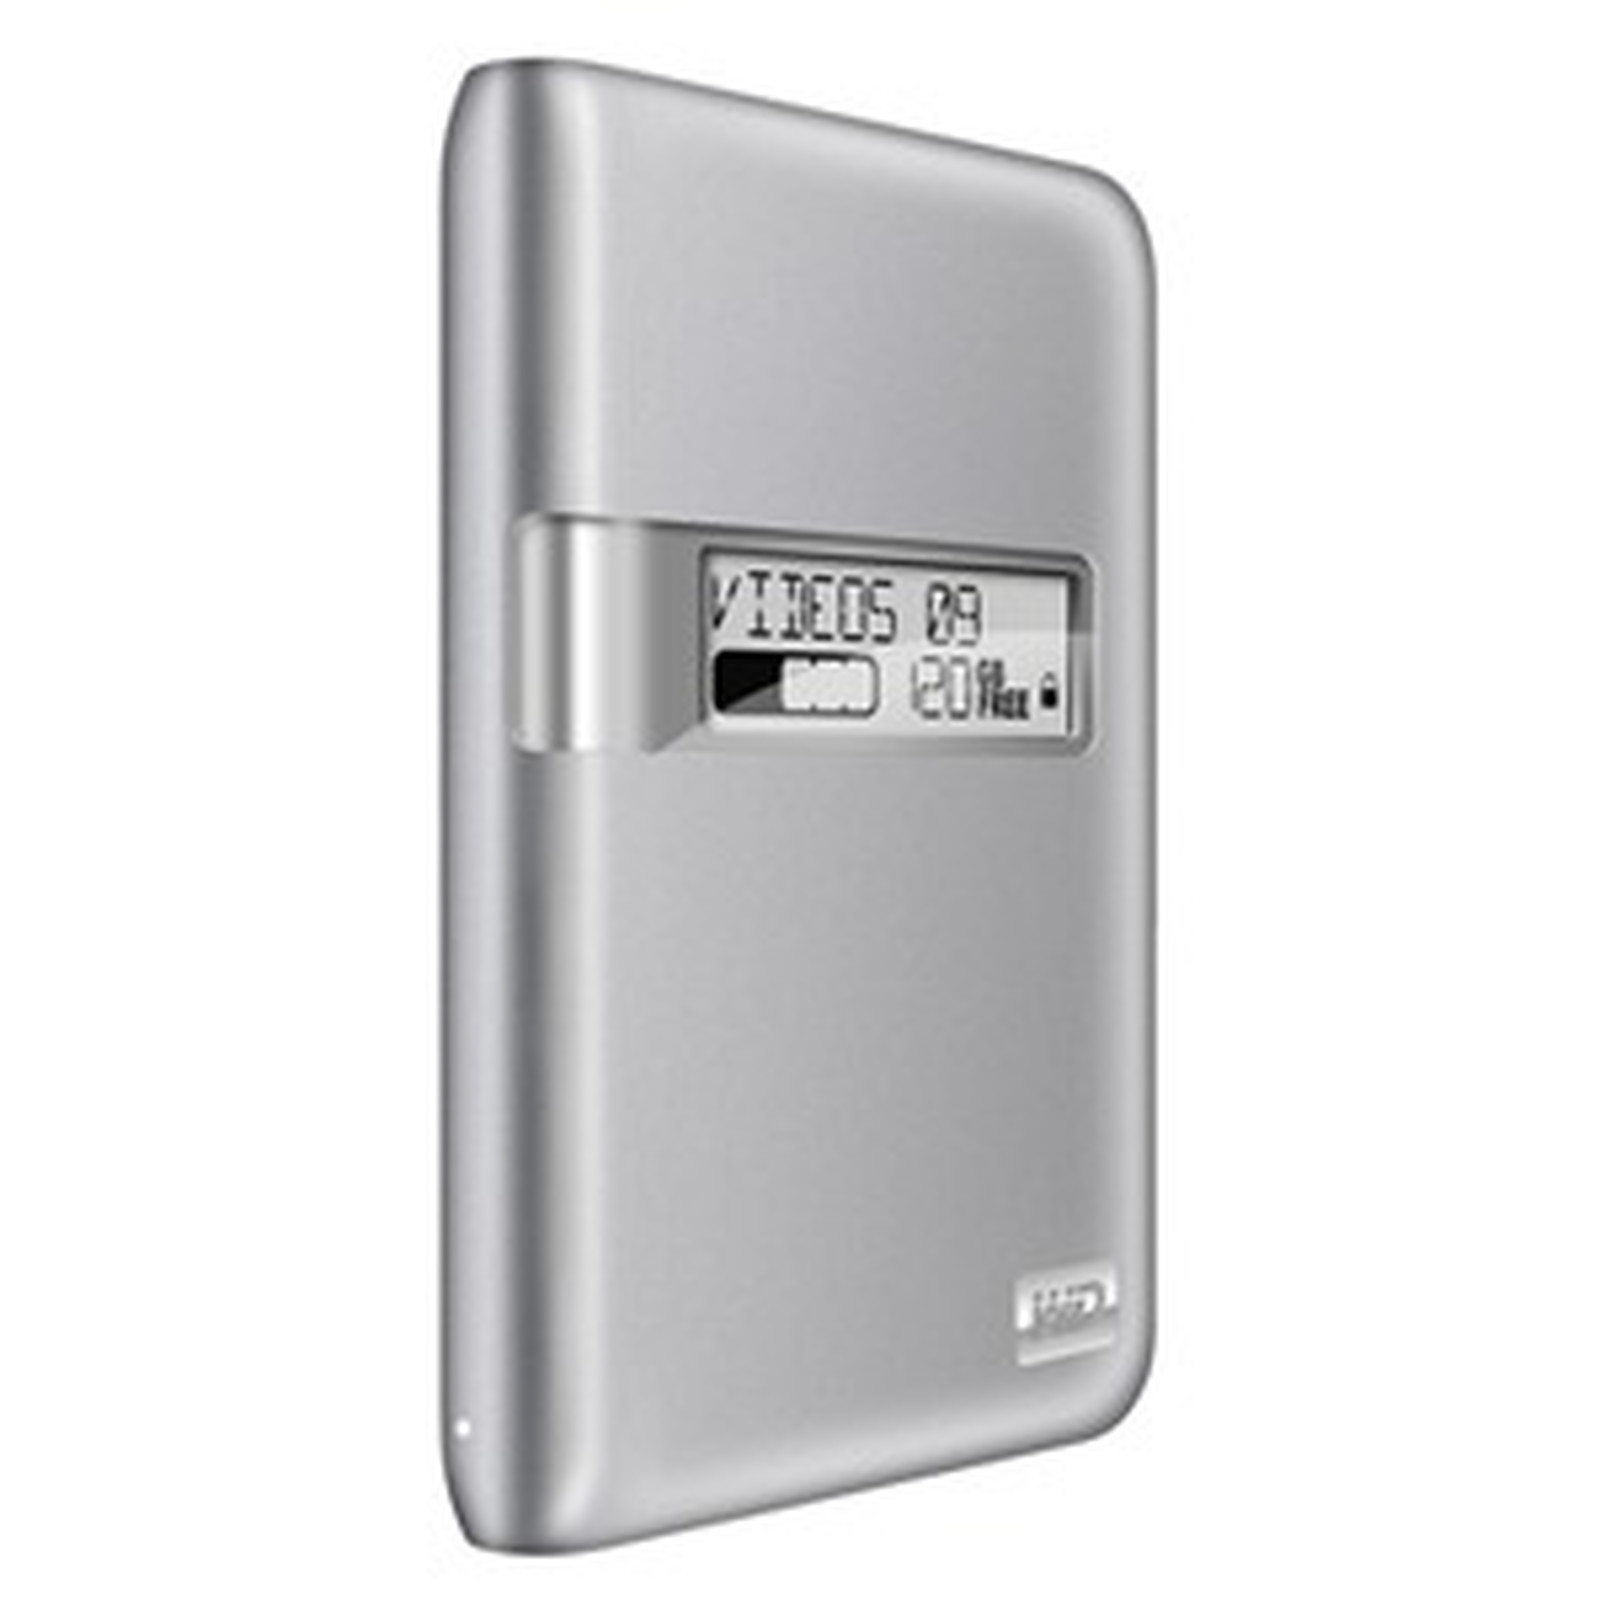 Western Digital My Passport Studio 500 GB USB 2.0/FireWire 800